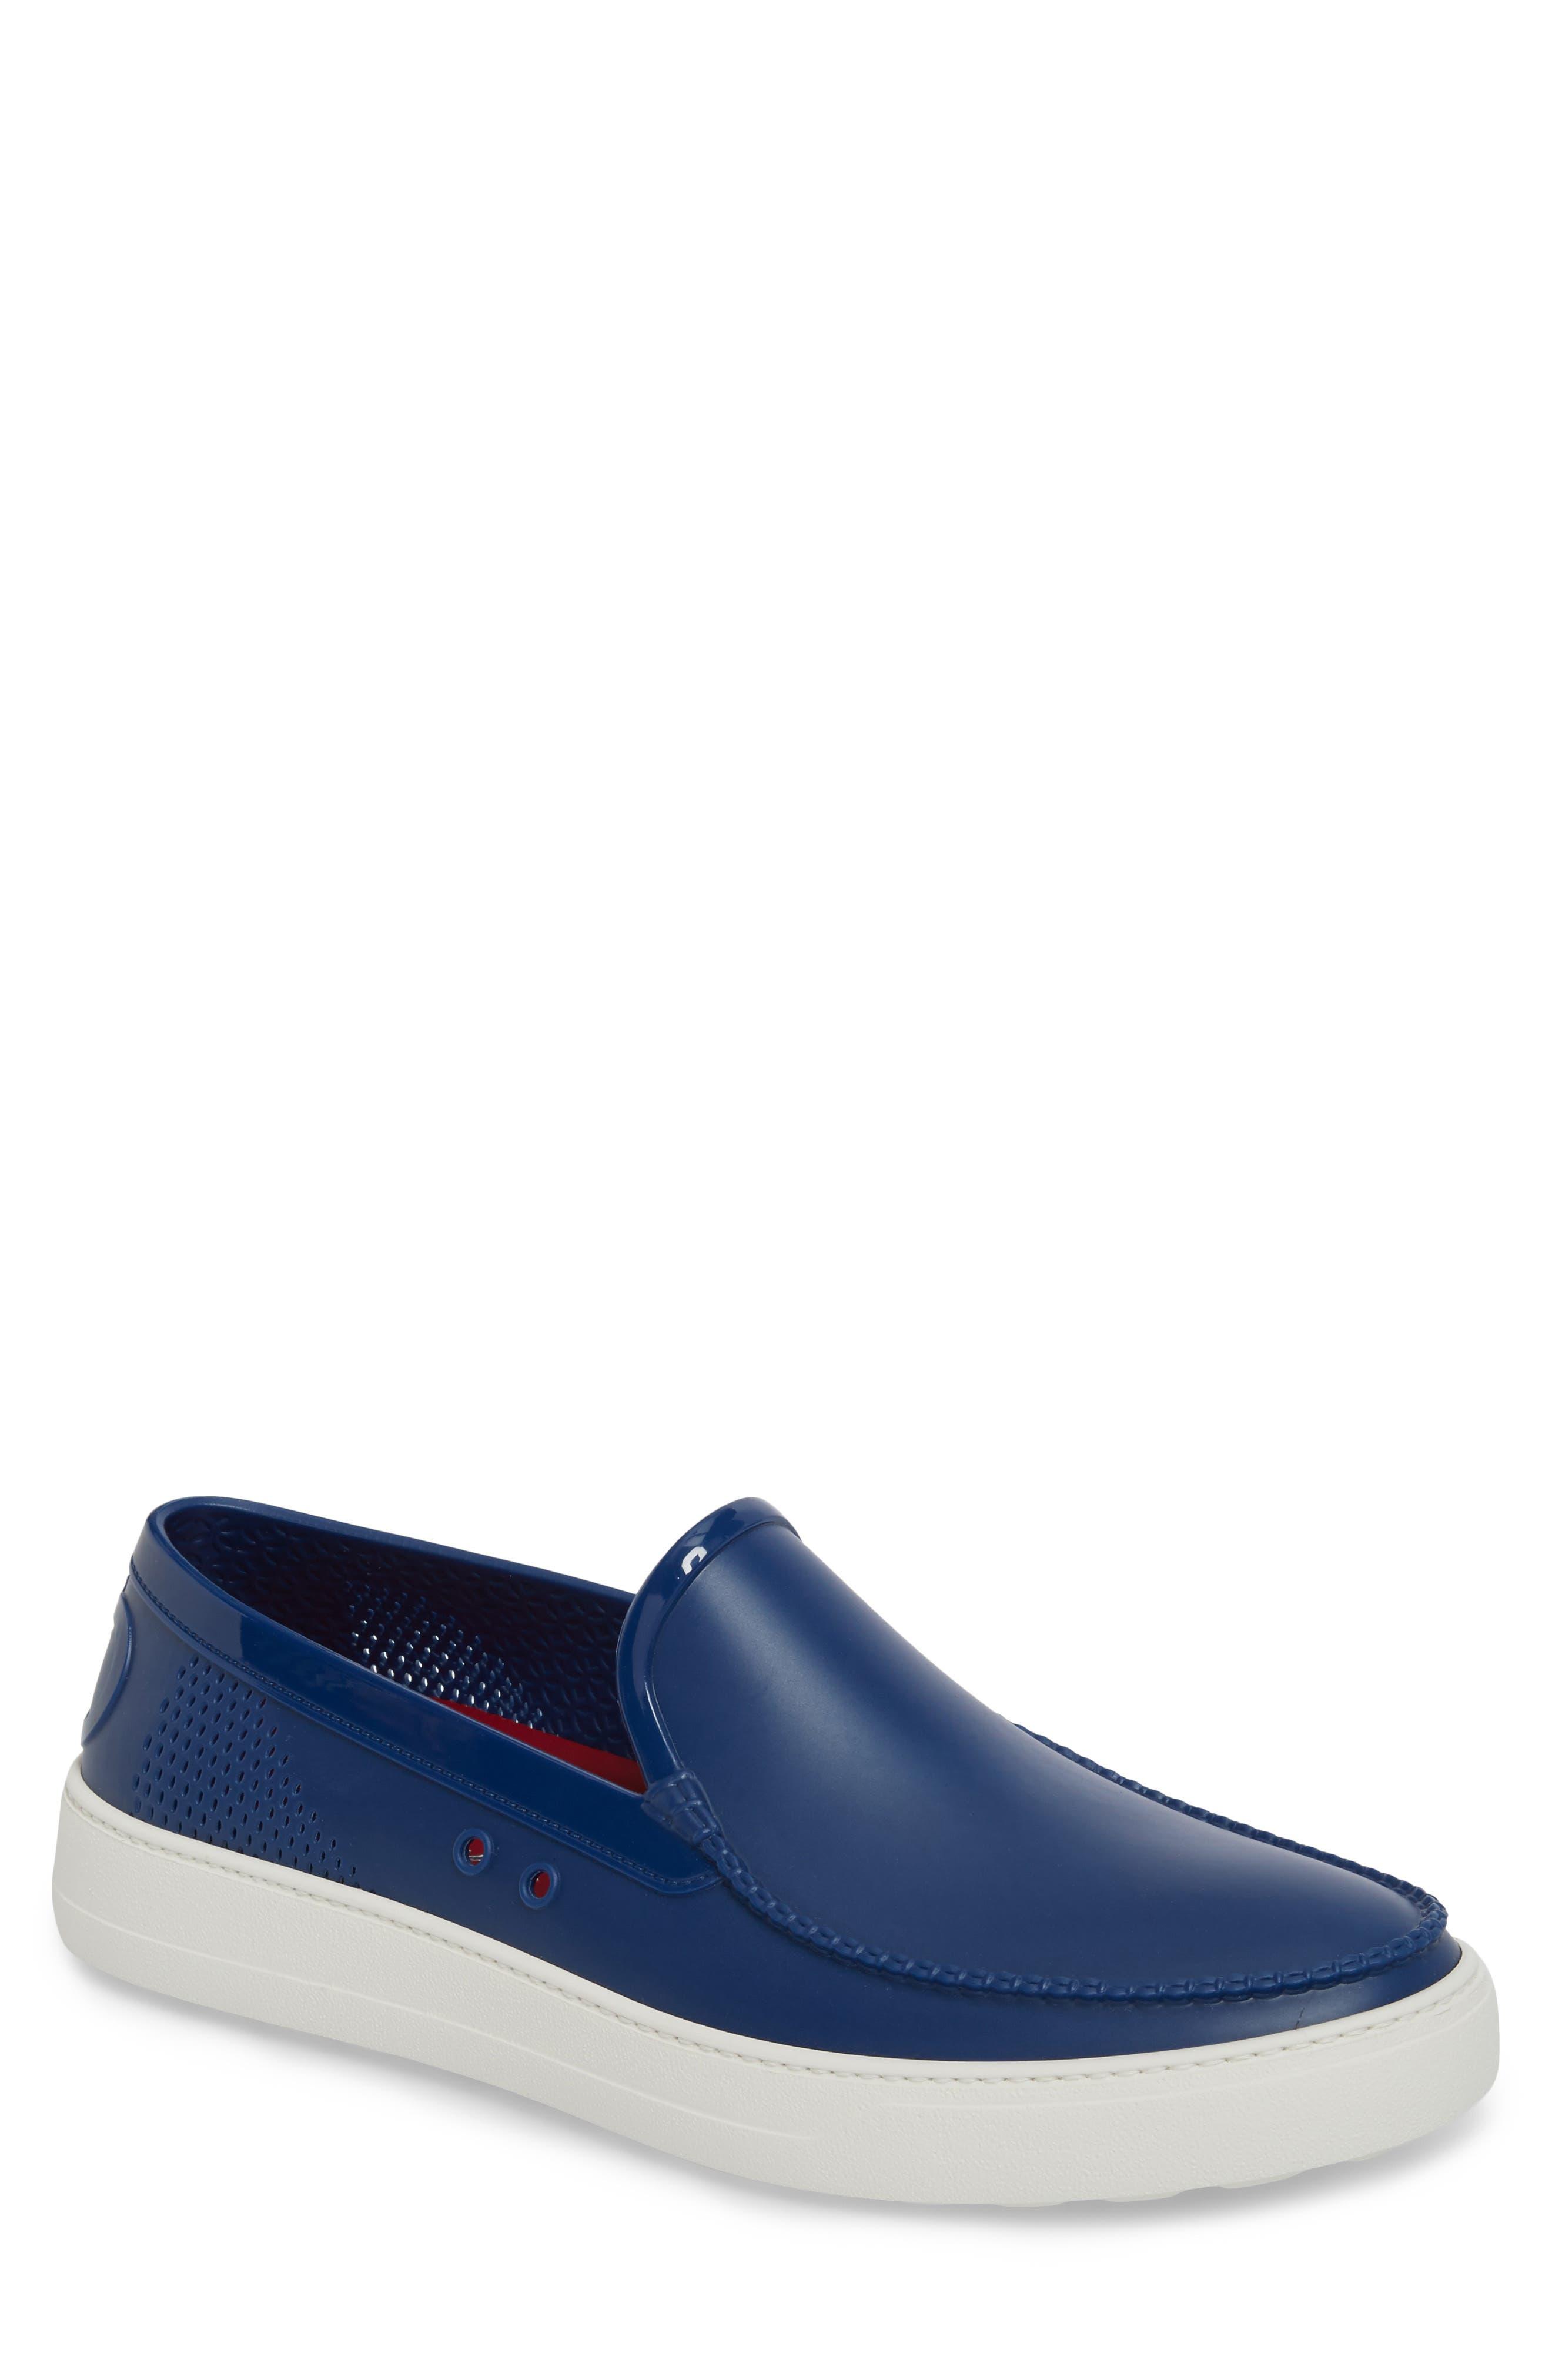 Fury Slip-On Sneaker,                         Main,                         color, JET BLUE LEATHER